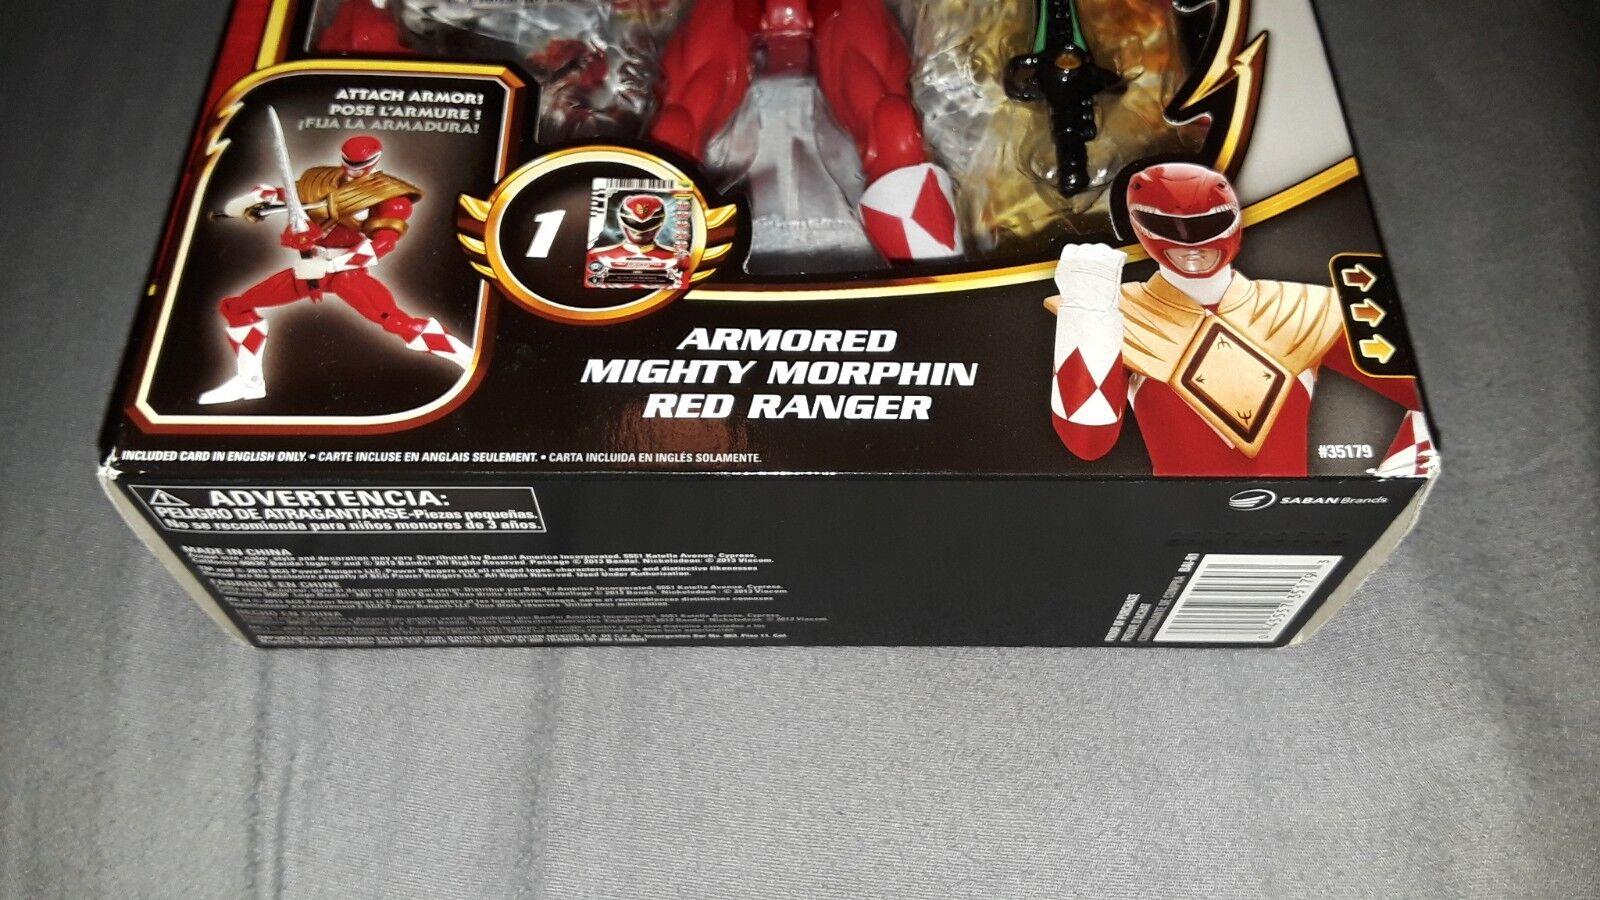 Power Megaforce Rangers Megaforce Power ArmoROT Mighty Morphin ROT Ranger Figure c2438f